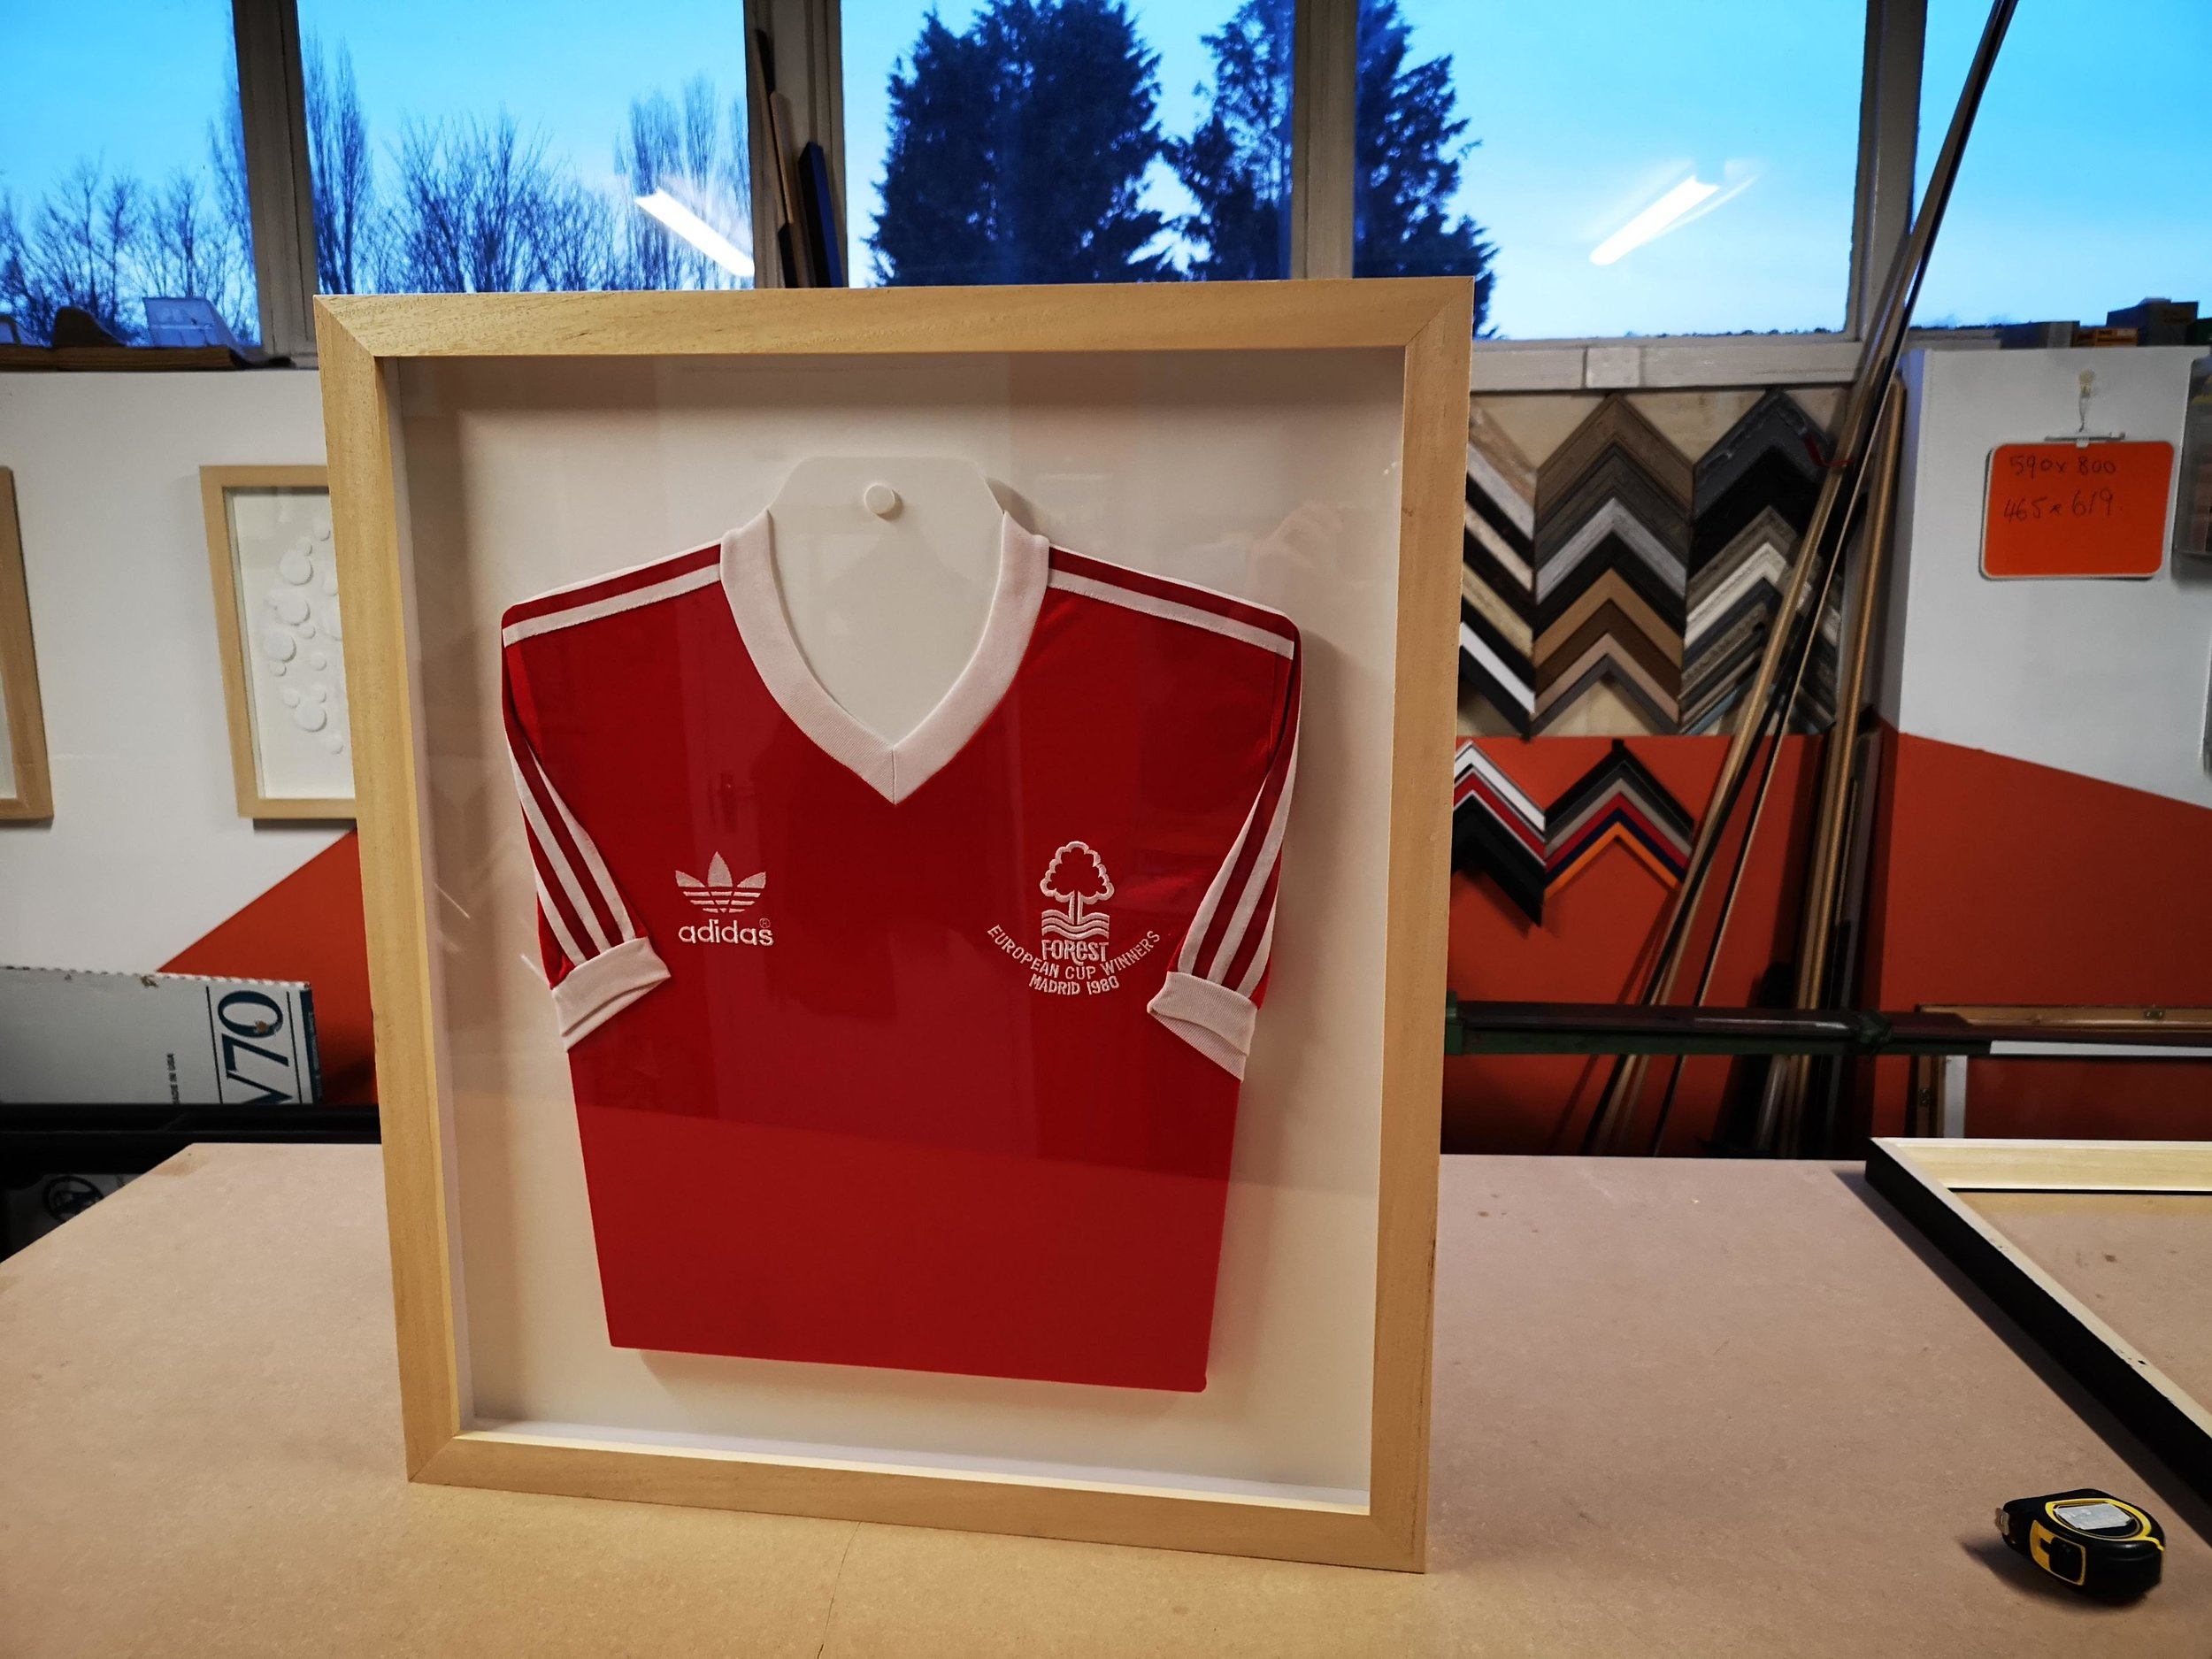 nottingham forest football club european winners shirt framed